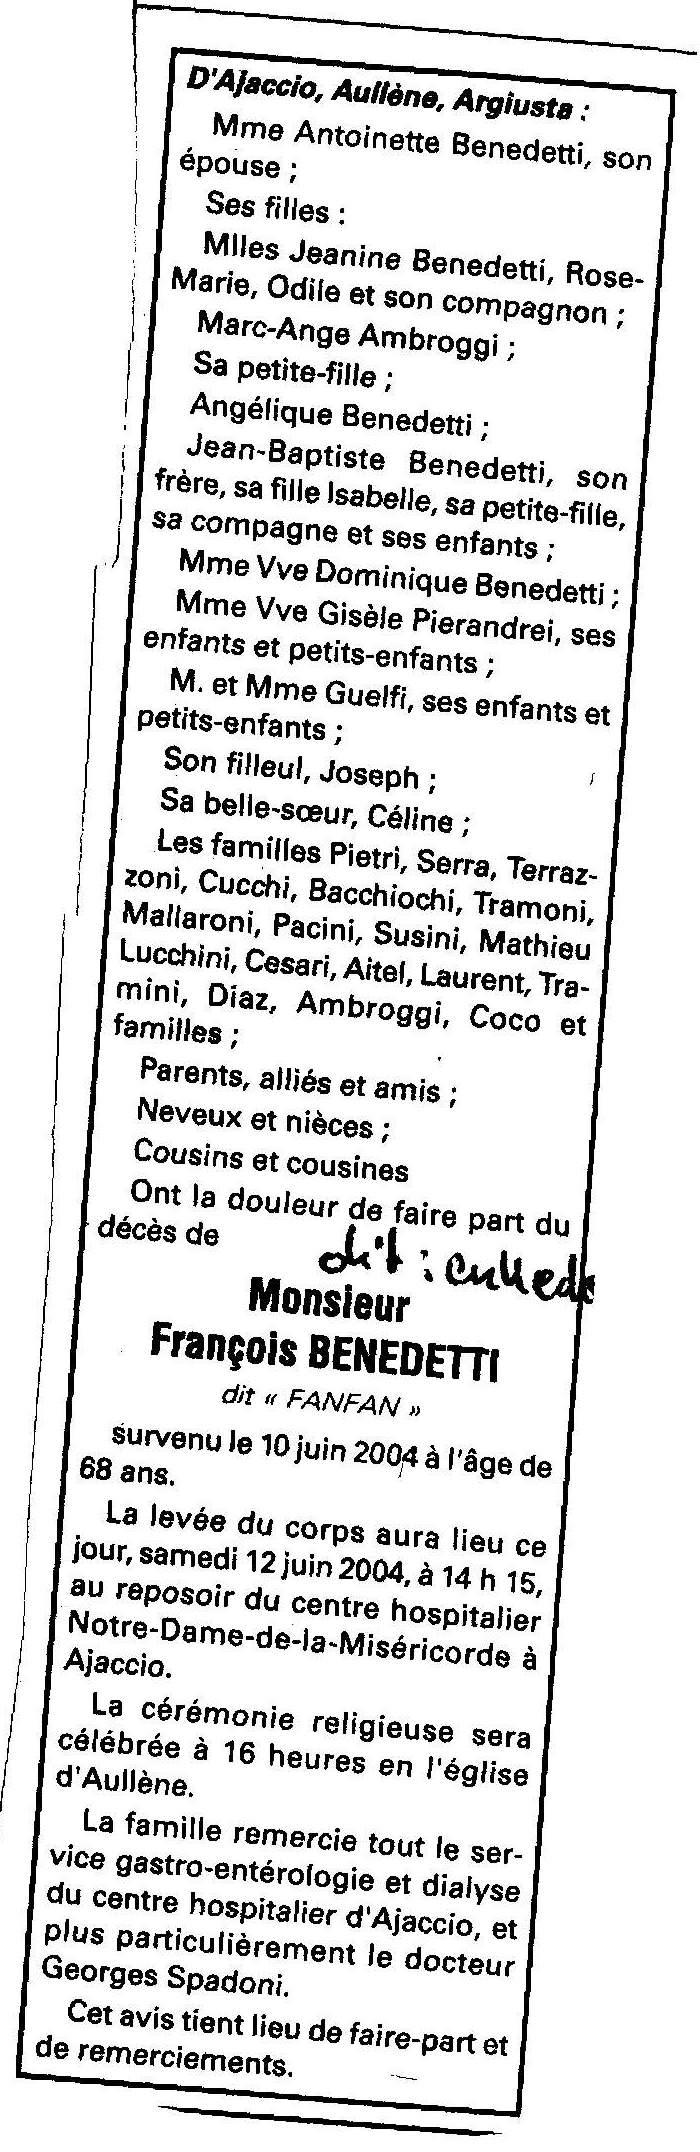 poli françois veuve mariani